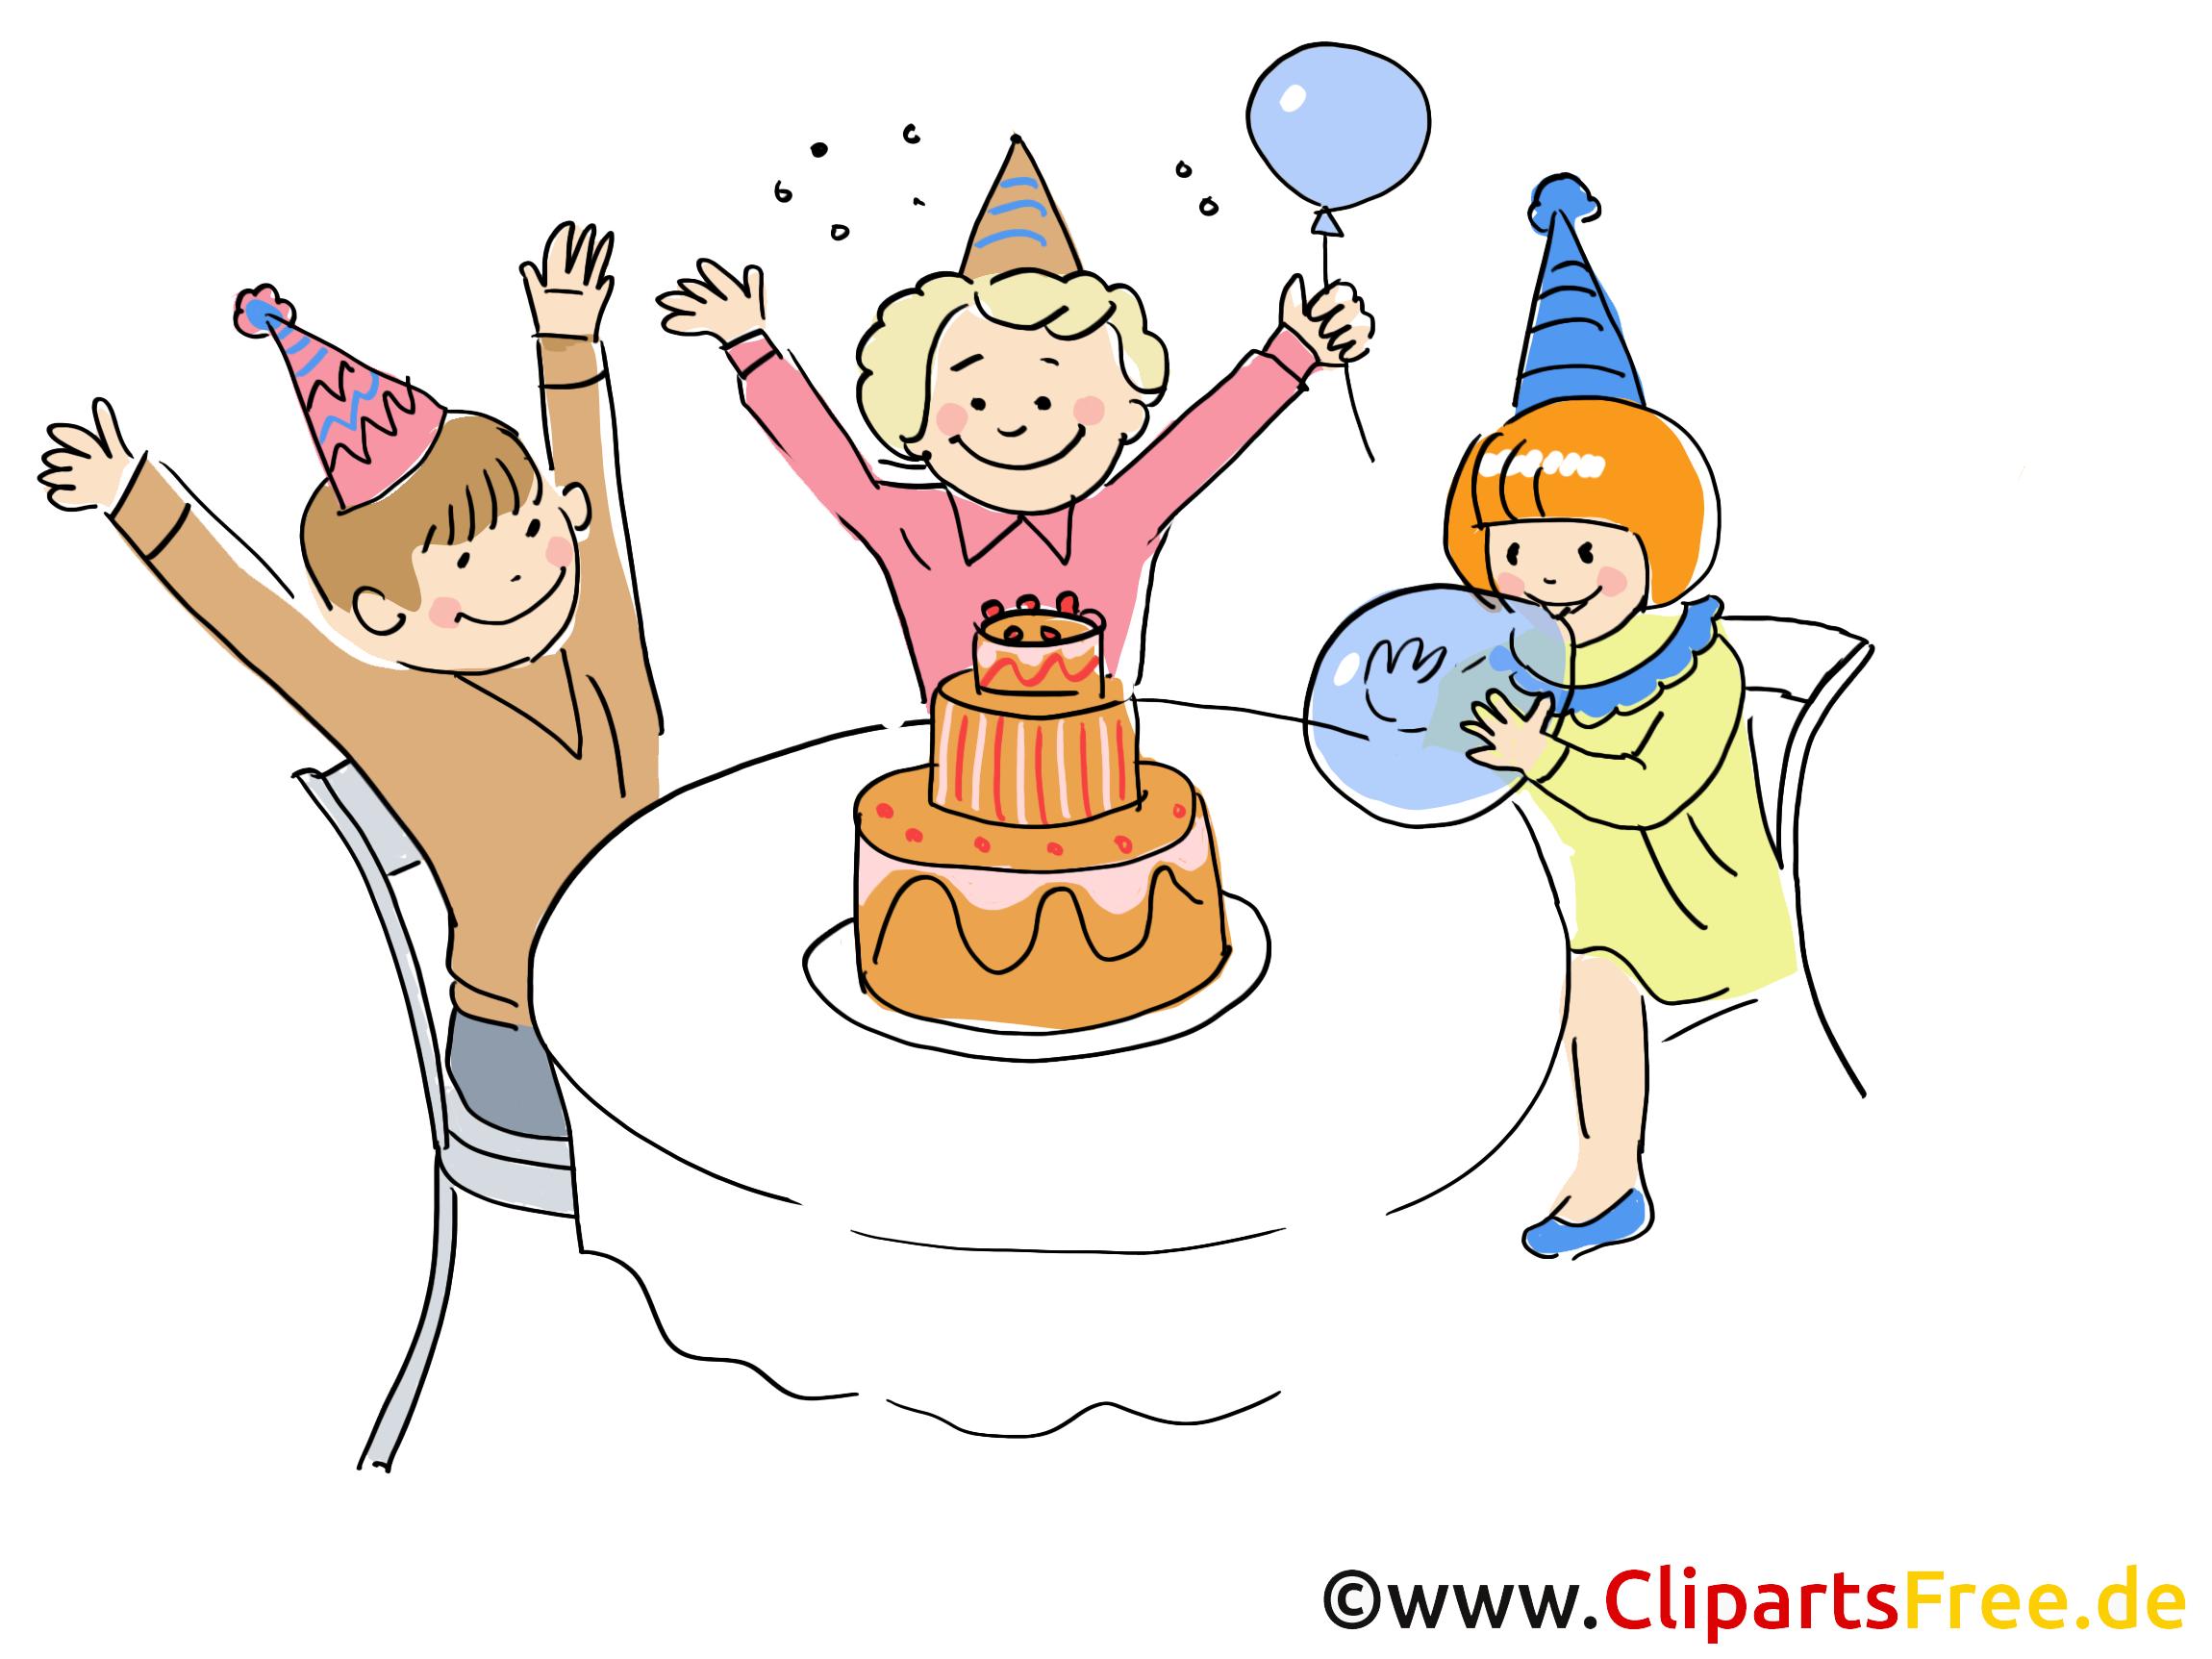 Bild clipart #5, Download drawings